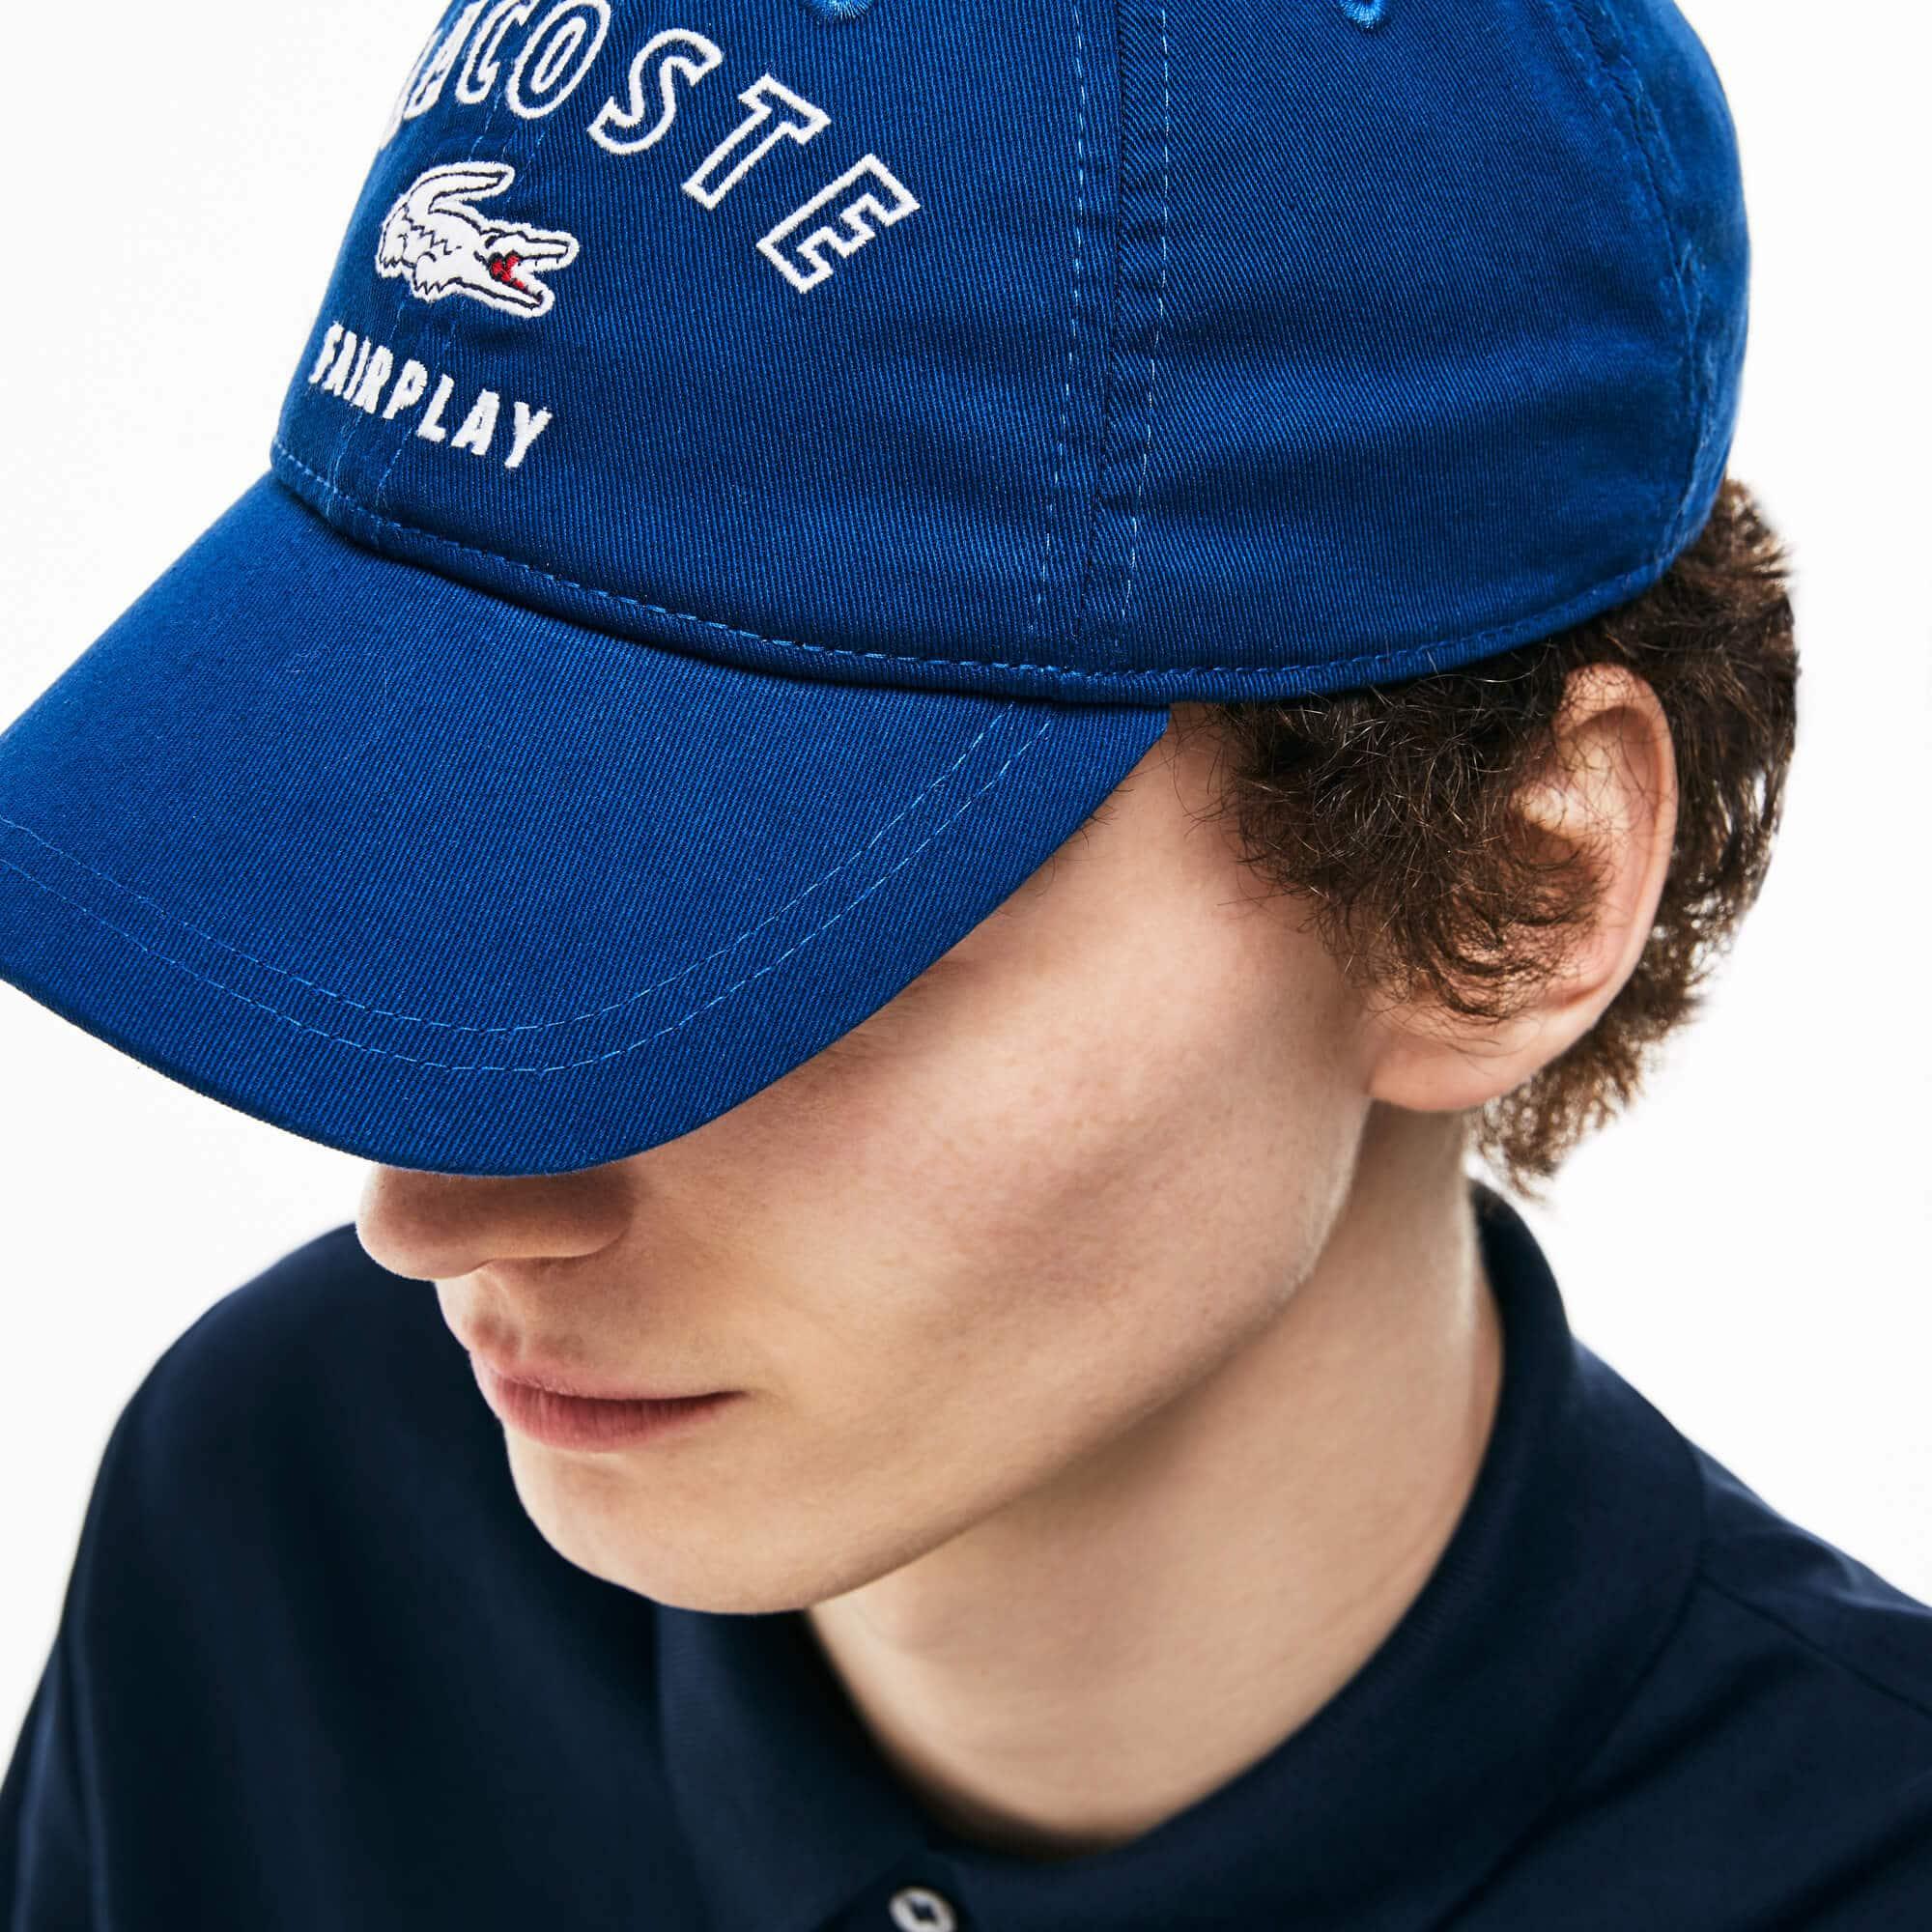 Men's Lacoste Fairplay Cotton Gabardine Cap